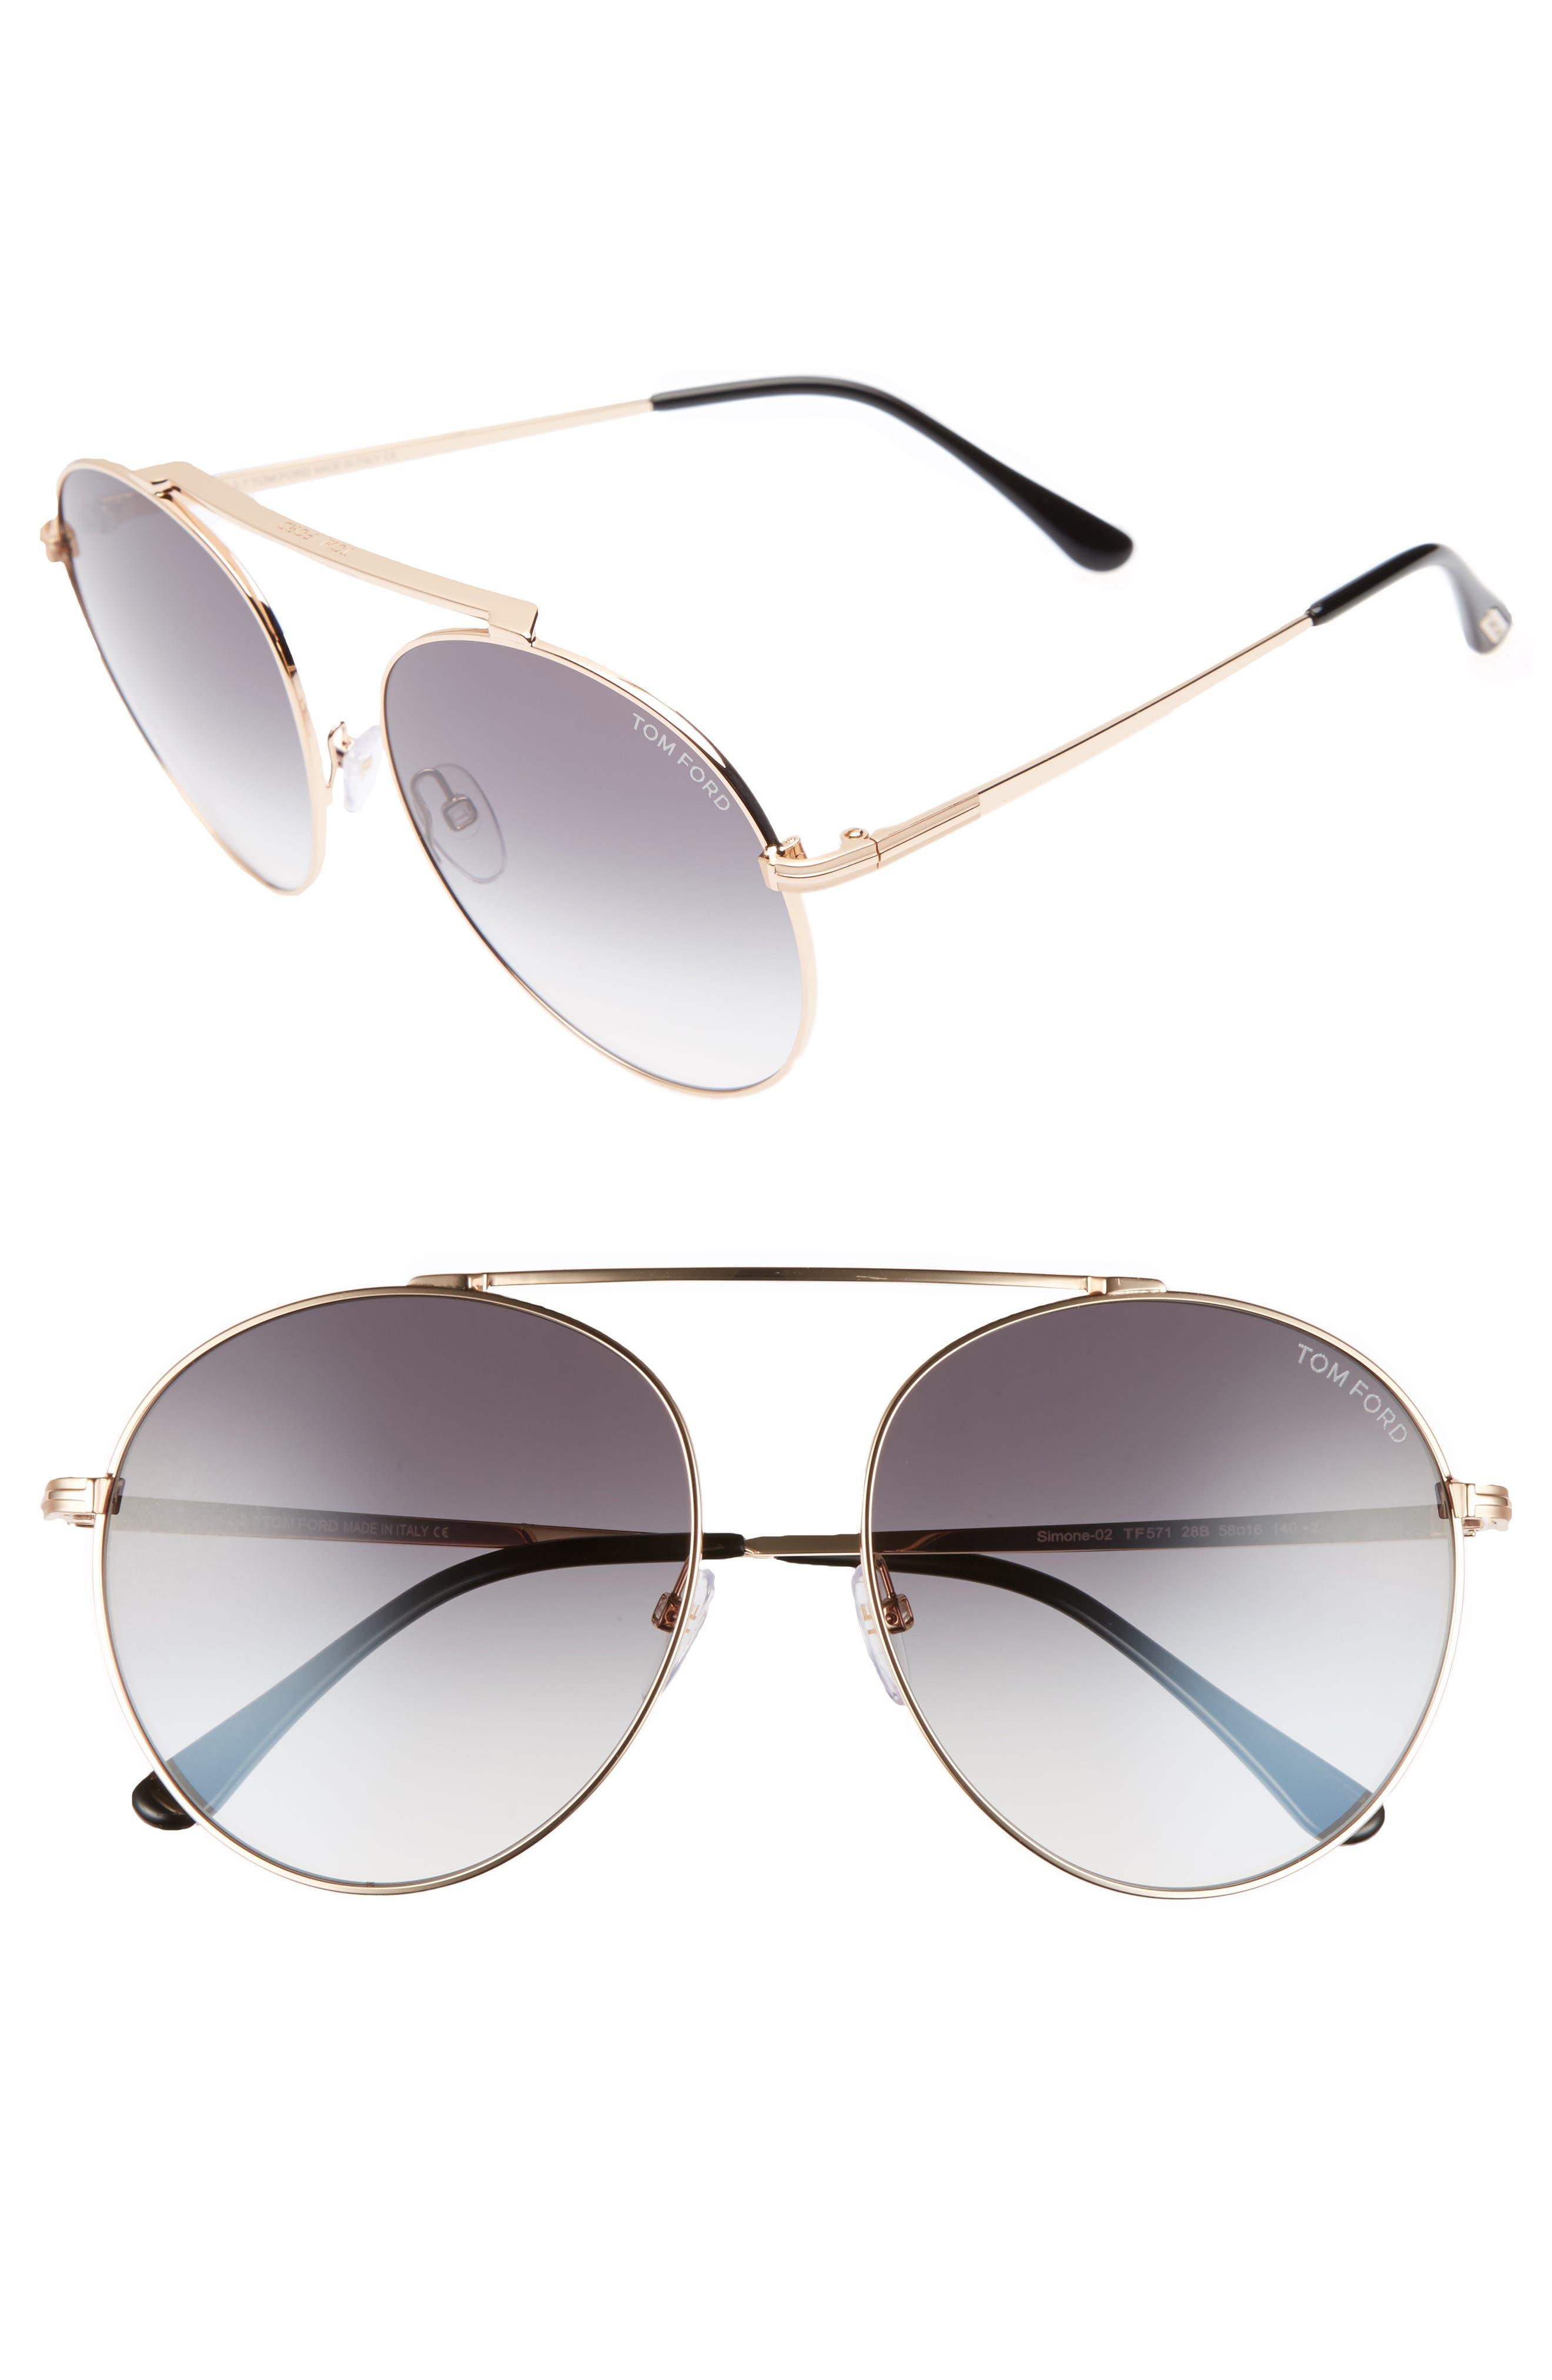 Simone 58mm Gradient Mirrored Round Sunglasses,                         Main,                         color, 710